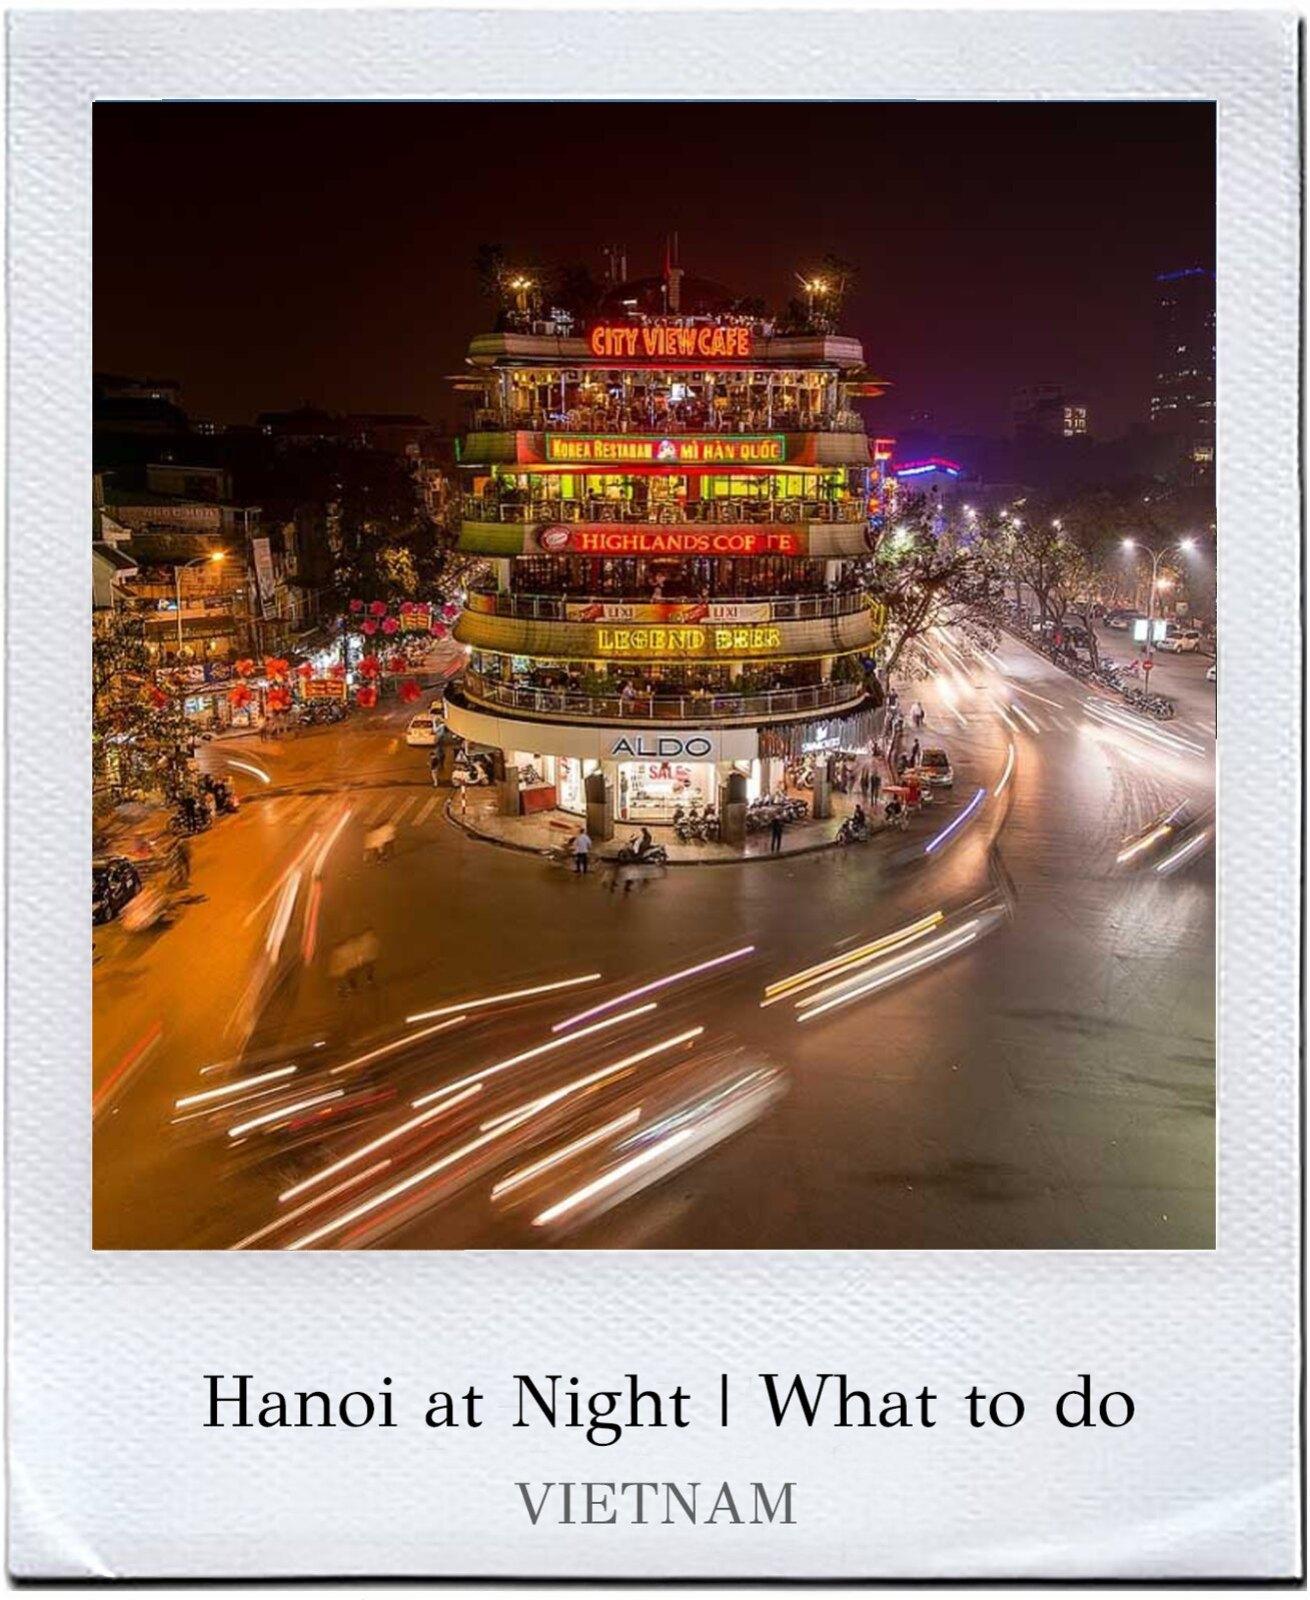 hanoi at night cover